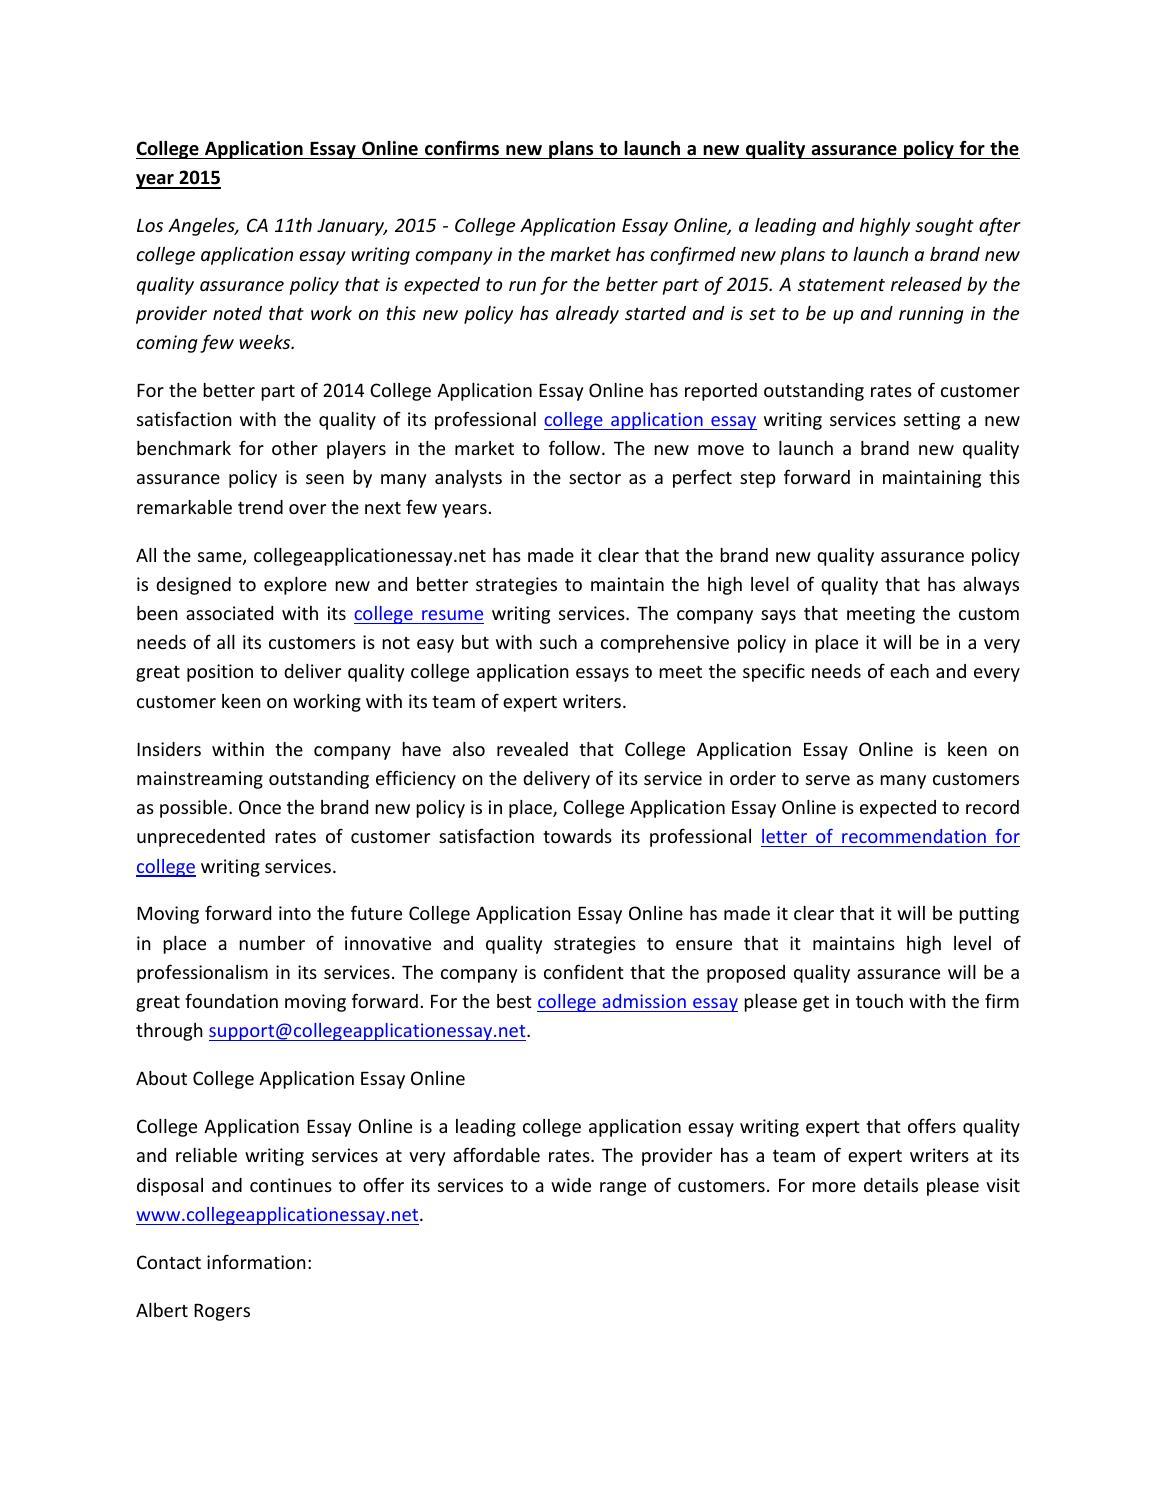 Argumentative essay introductions